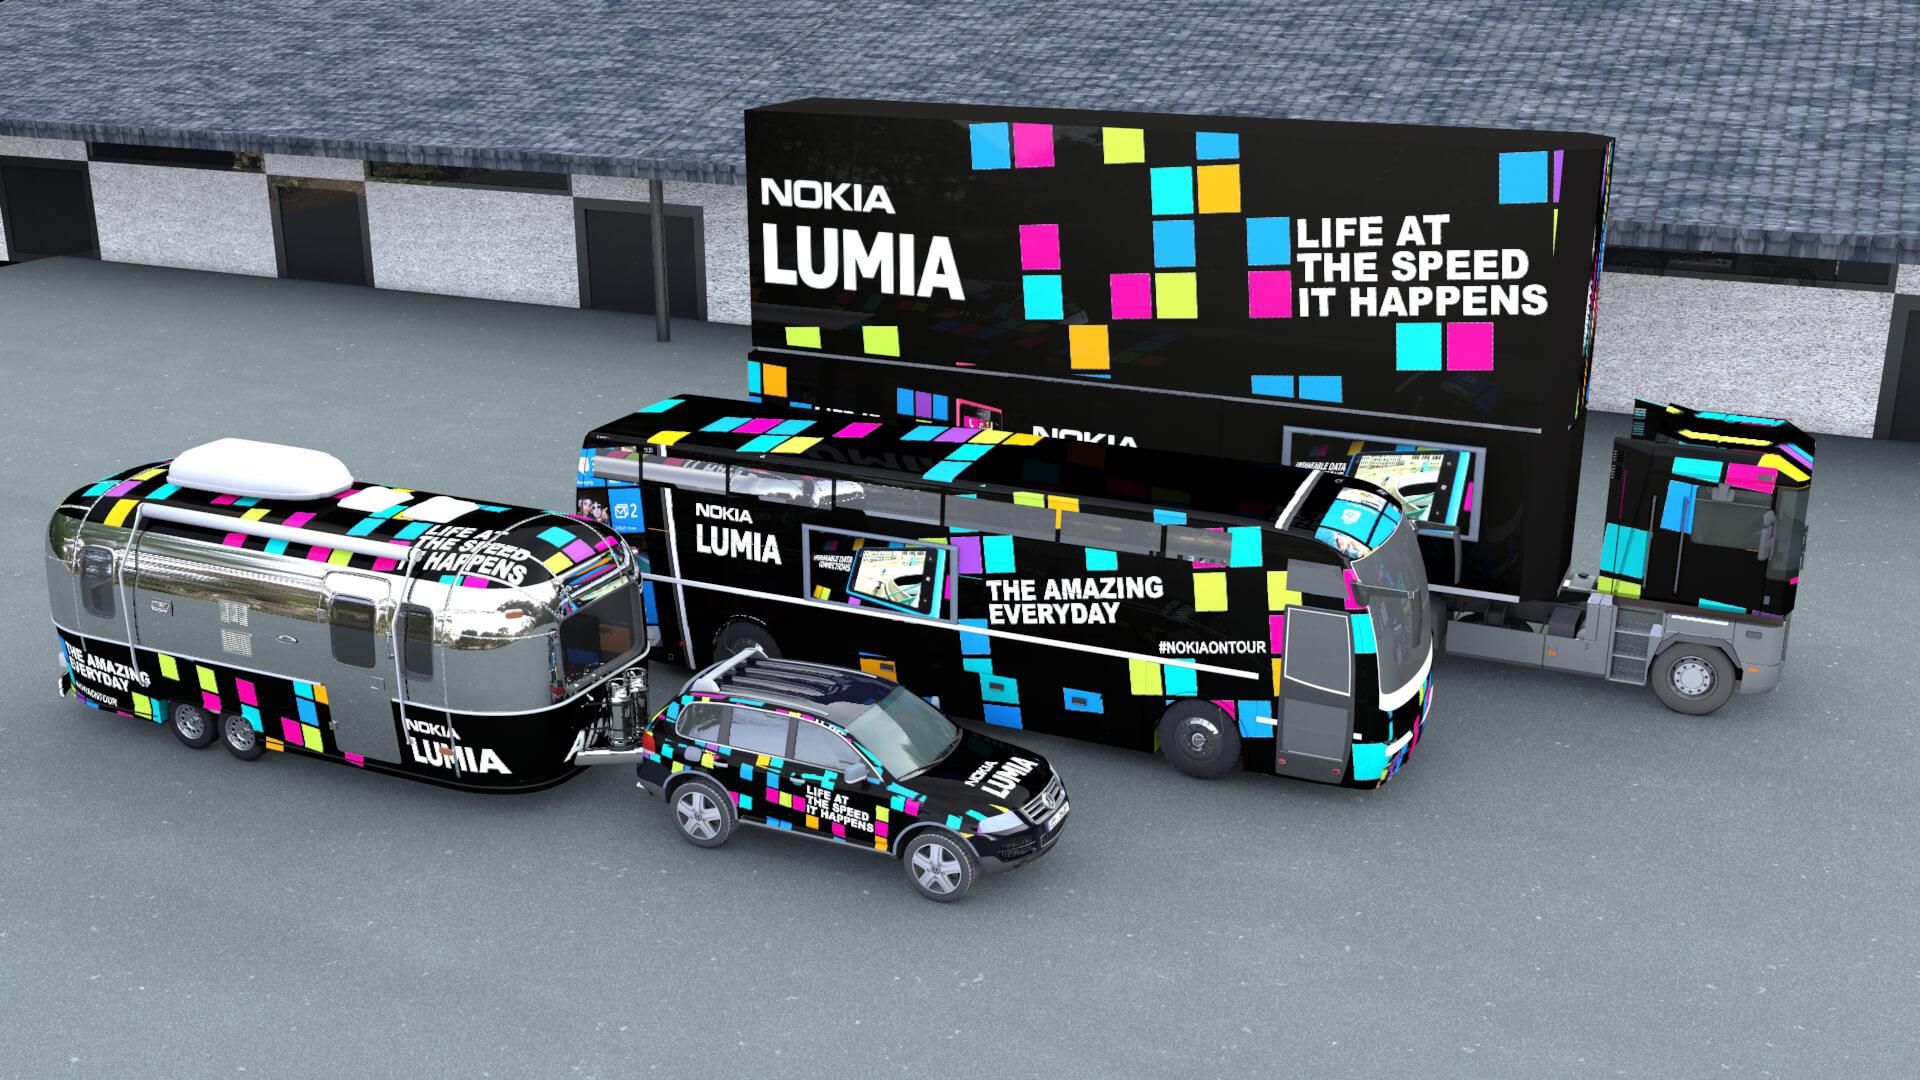 Nokia Lumia Vehicle Livery